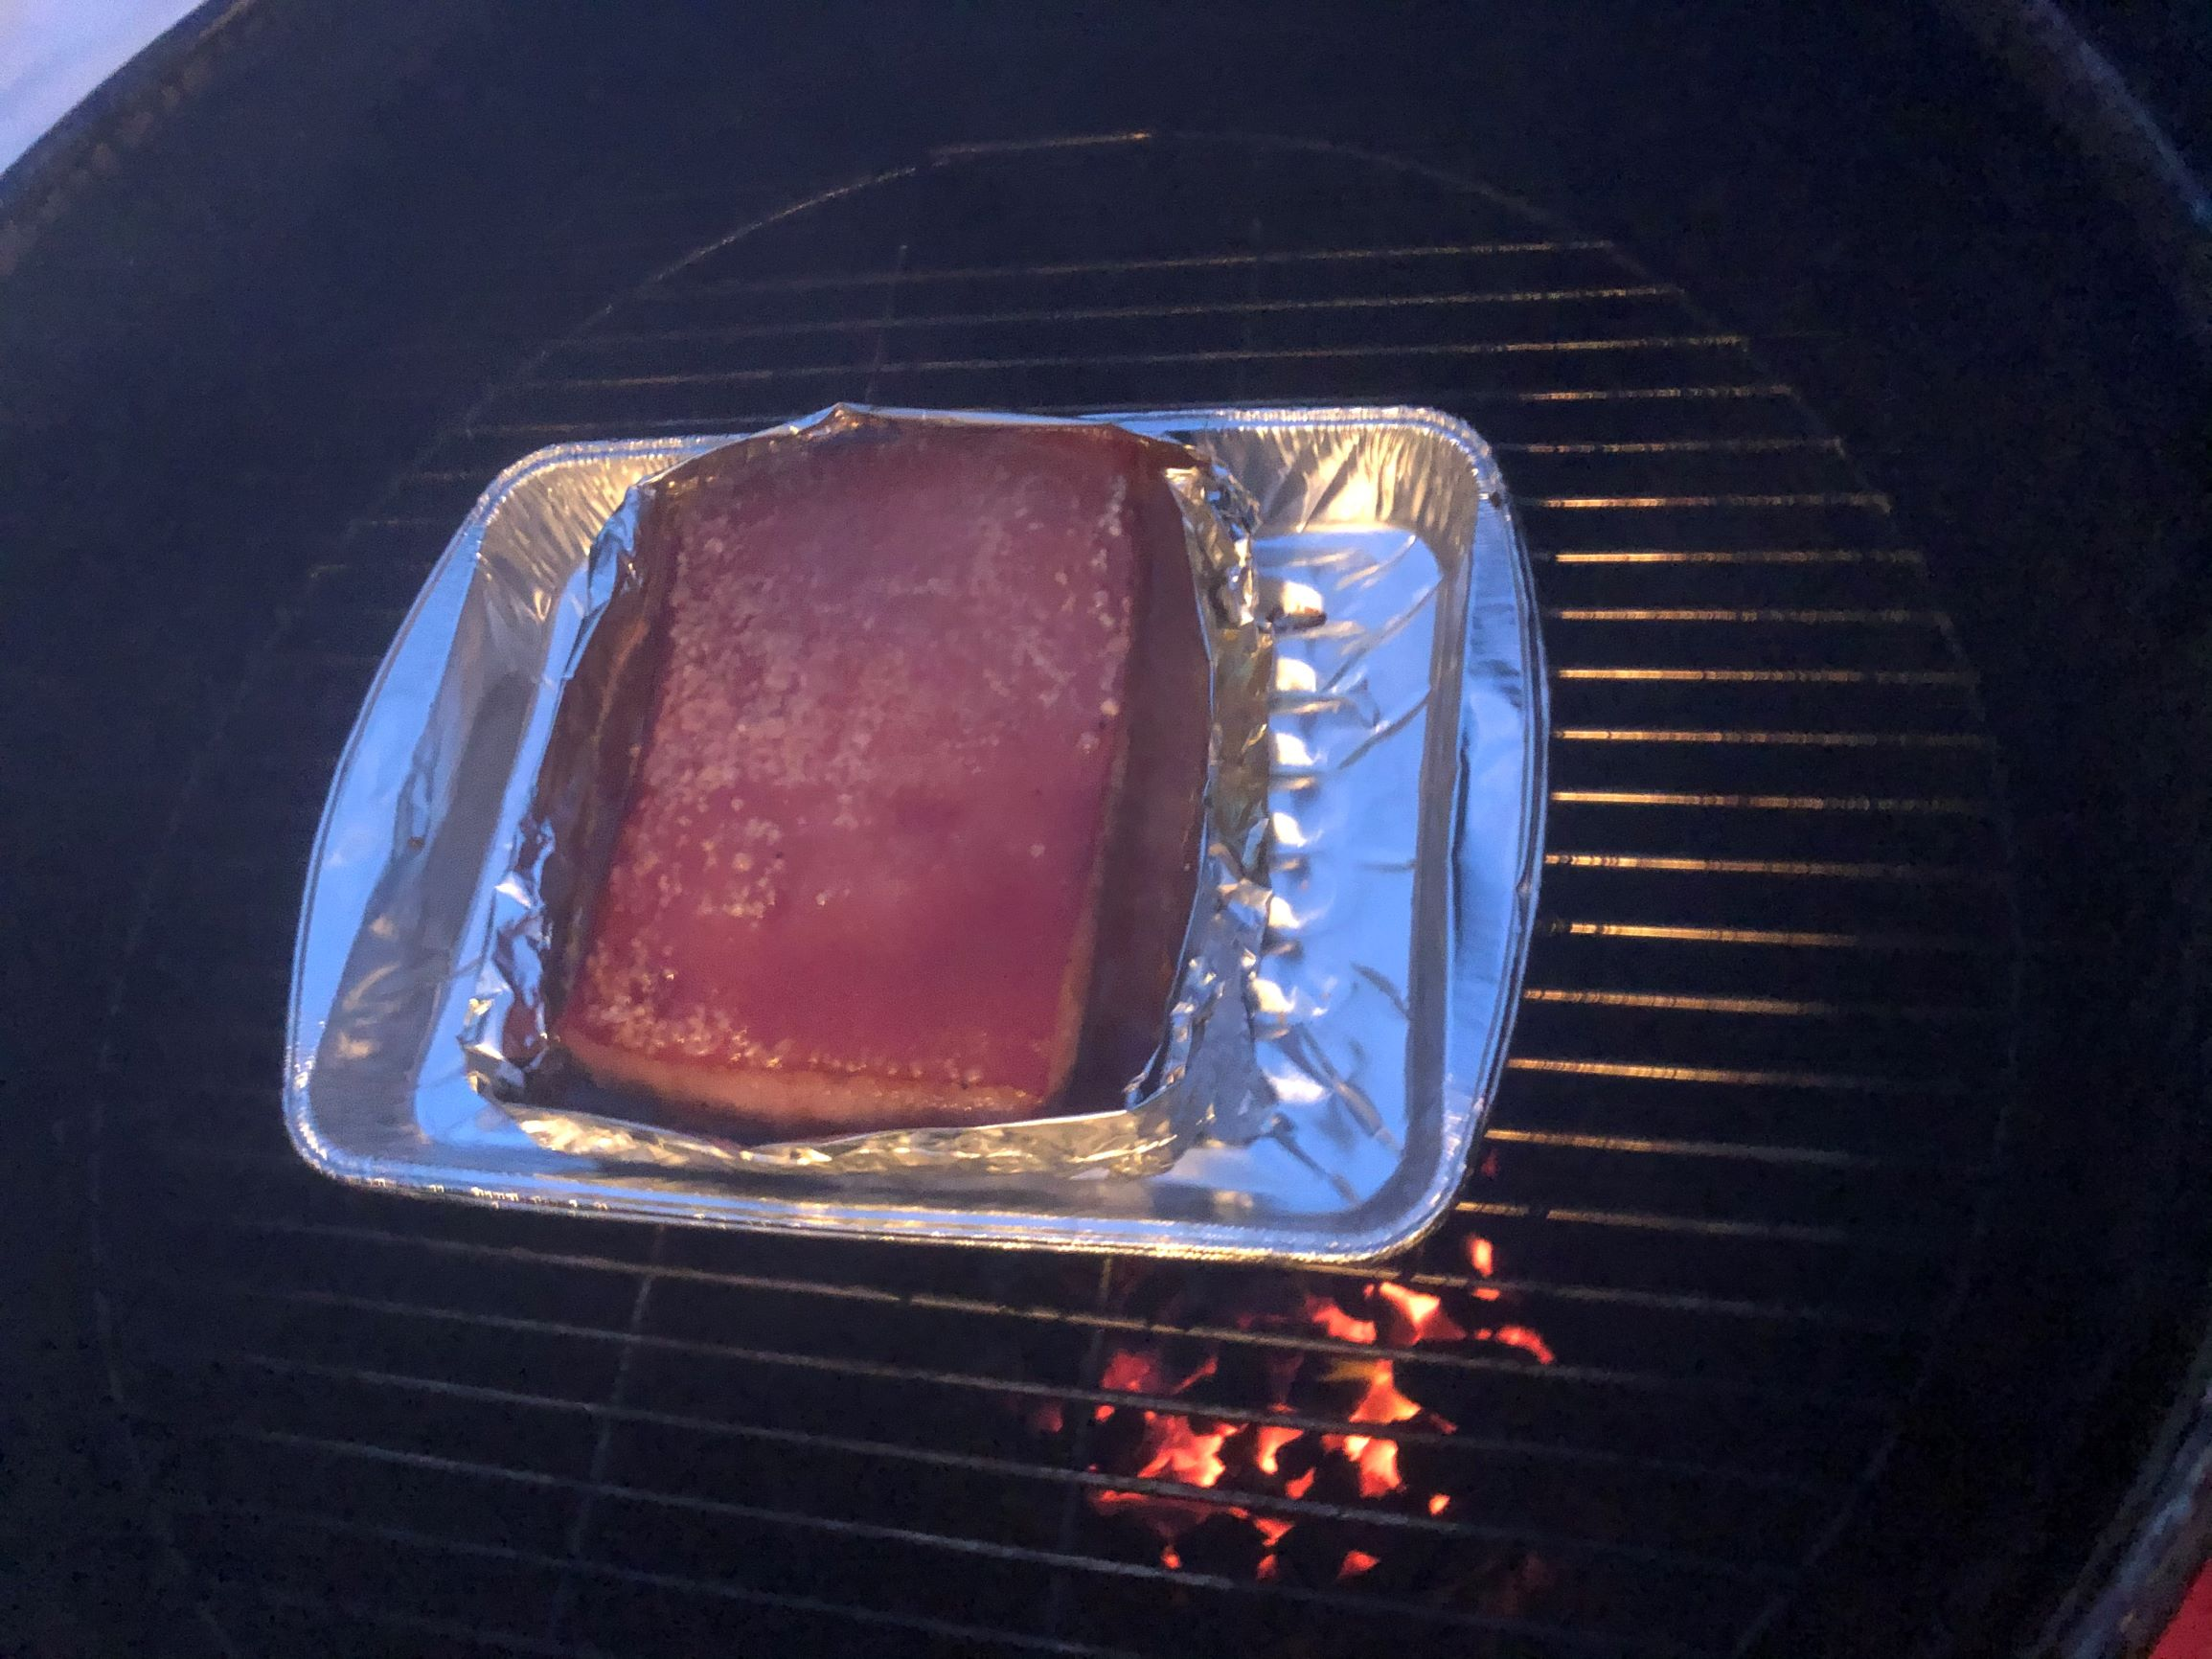 Siu Yuk Preparation - Pork belly after braising